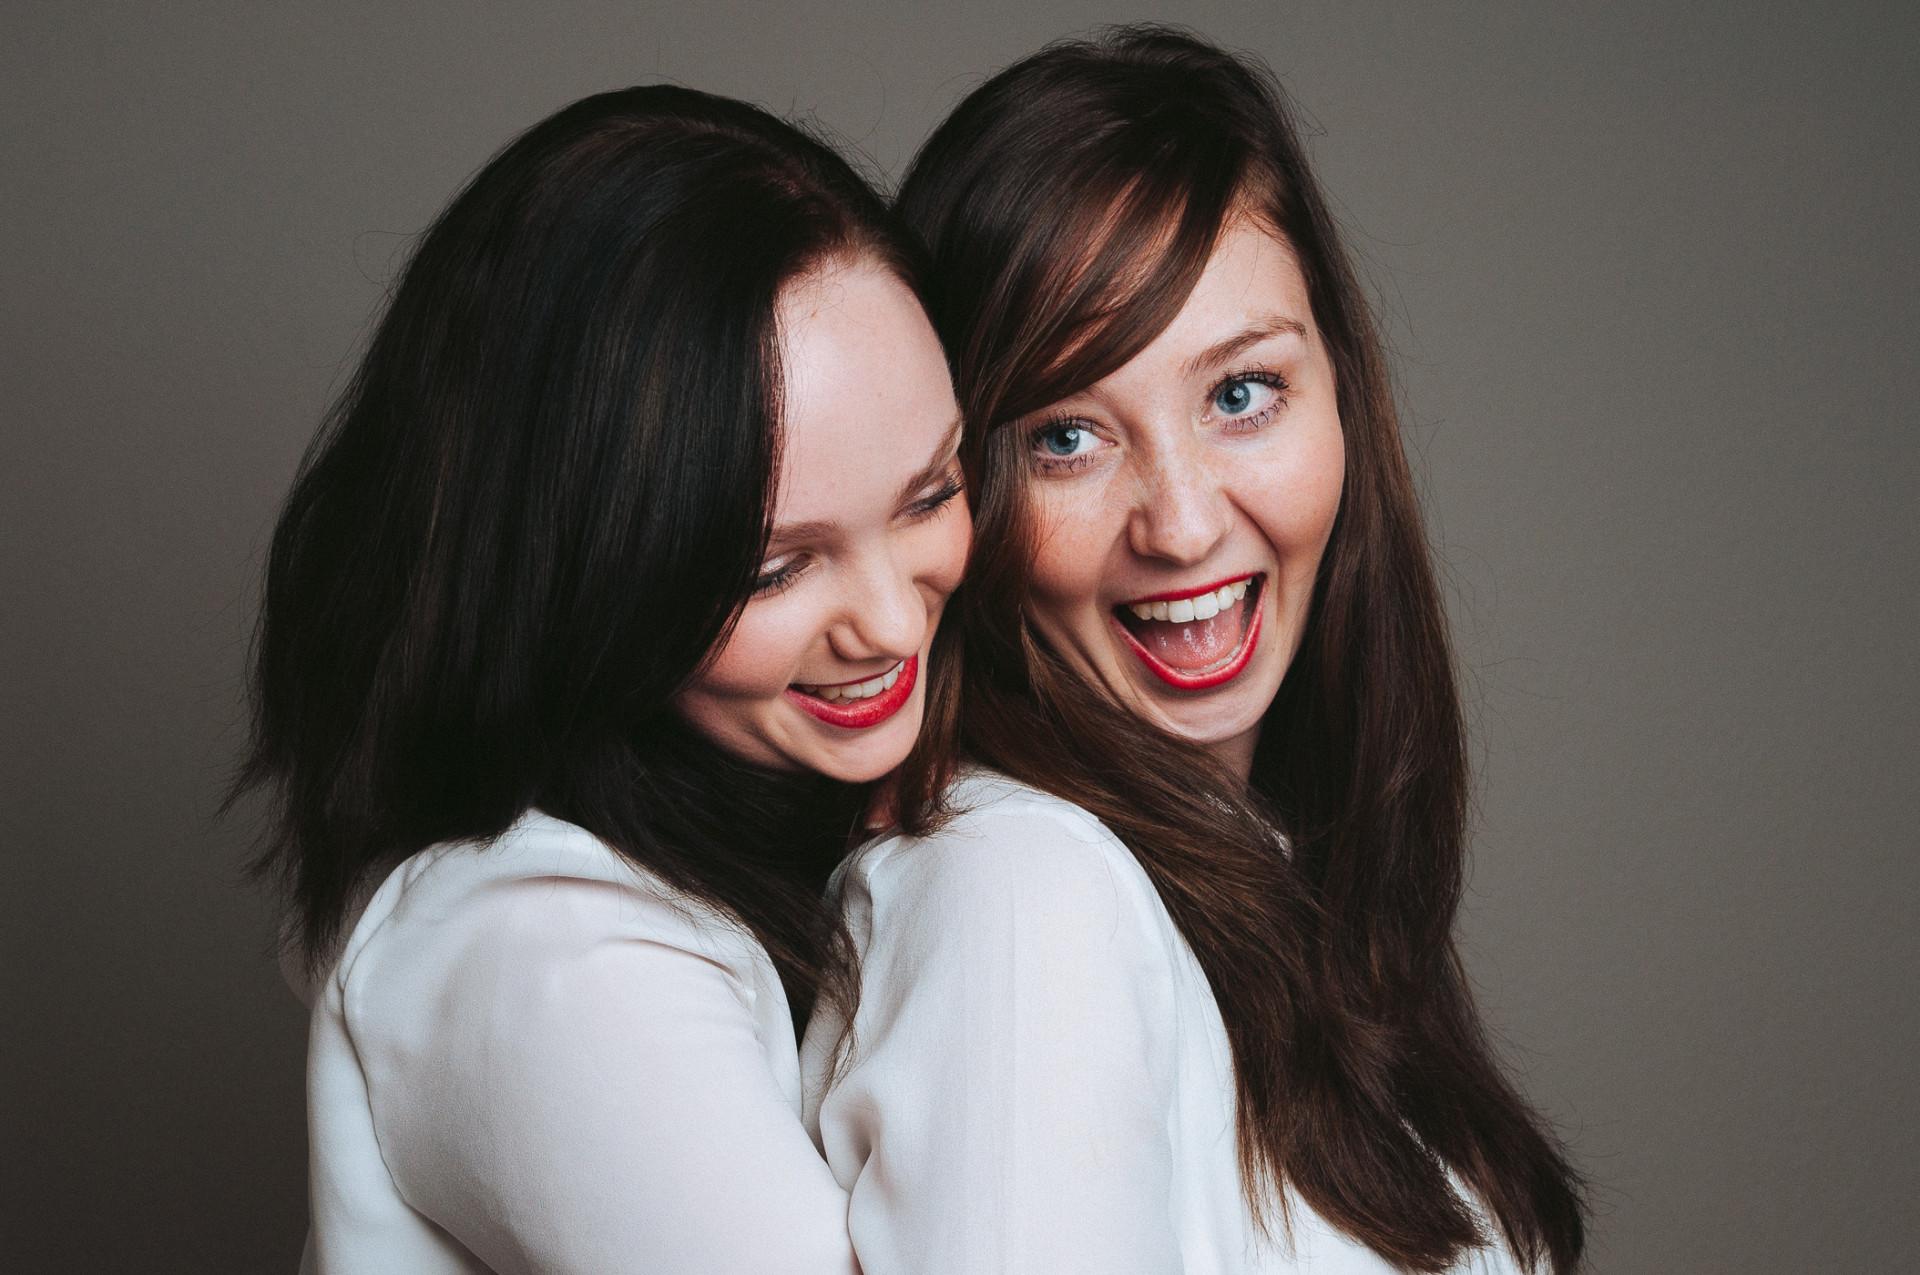 Ariane + Julia